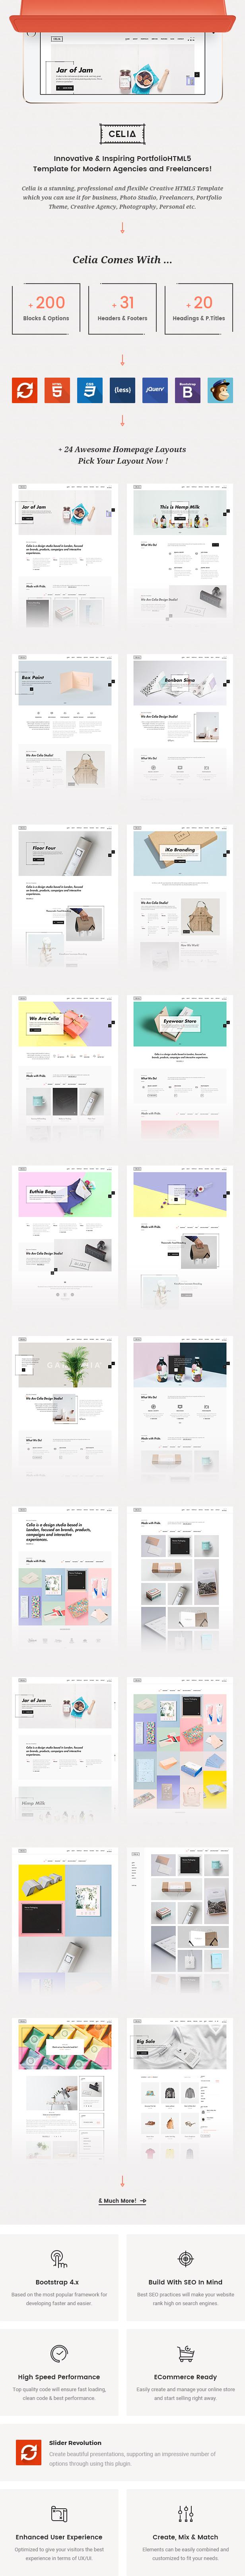 Celia - Innovative and Inspiring Portfolio HTML5 Template for Modern Agencies and Freelancers - 2